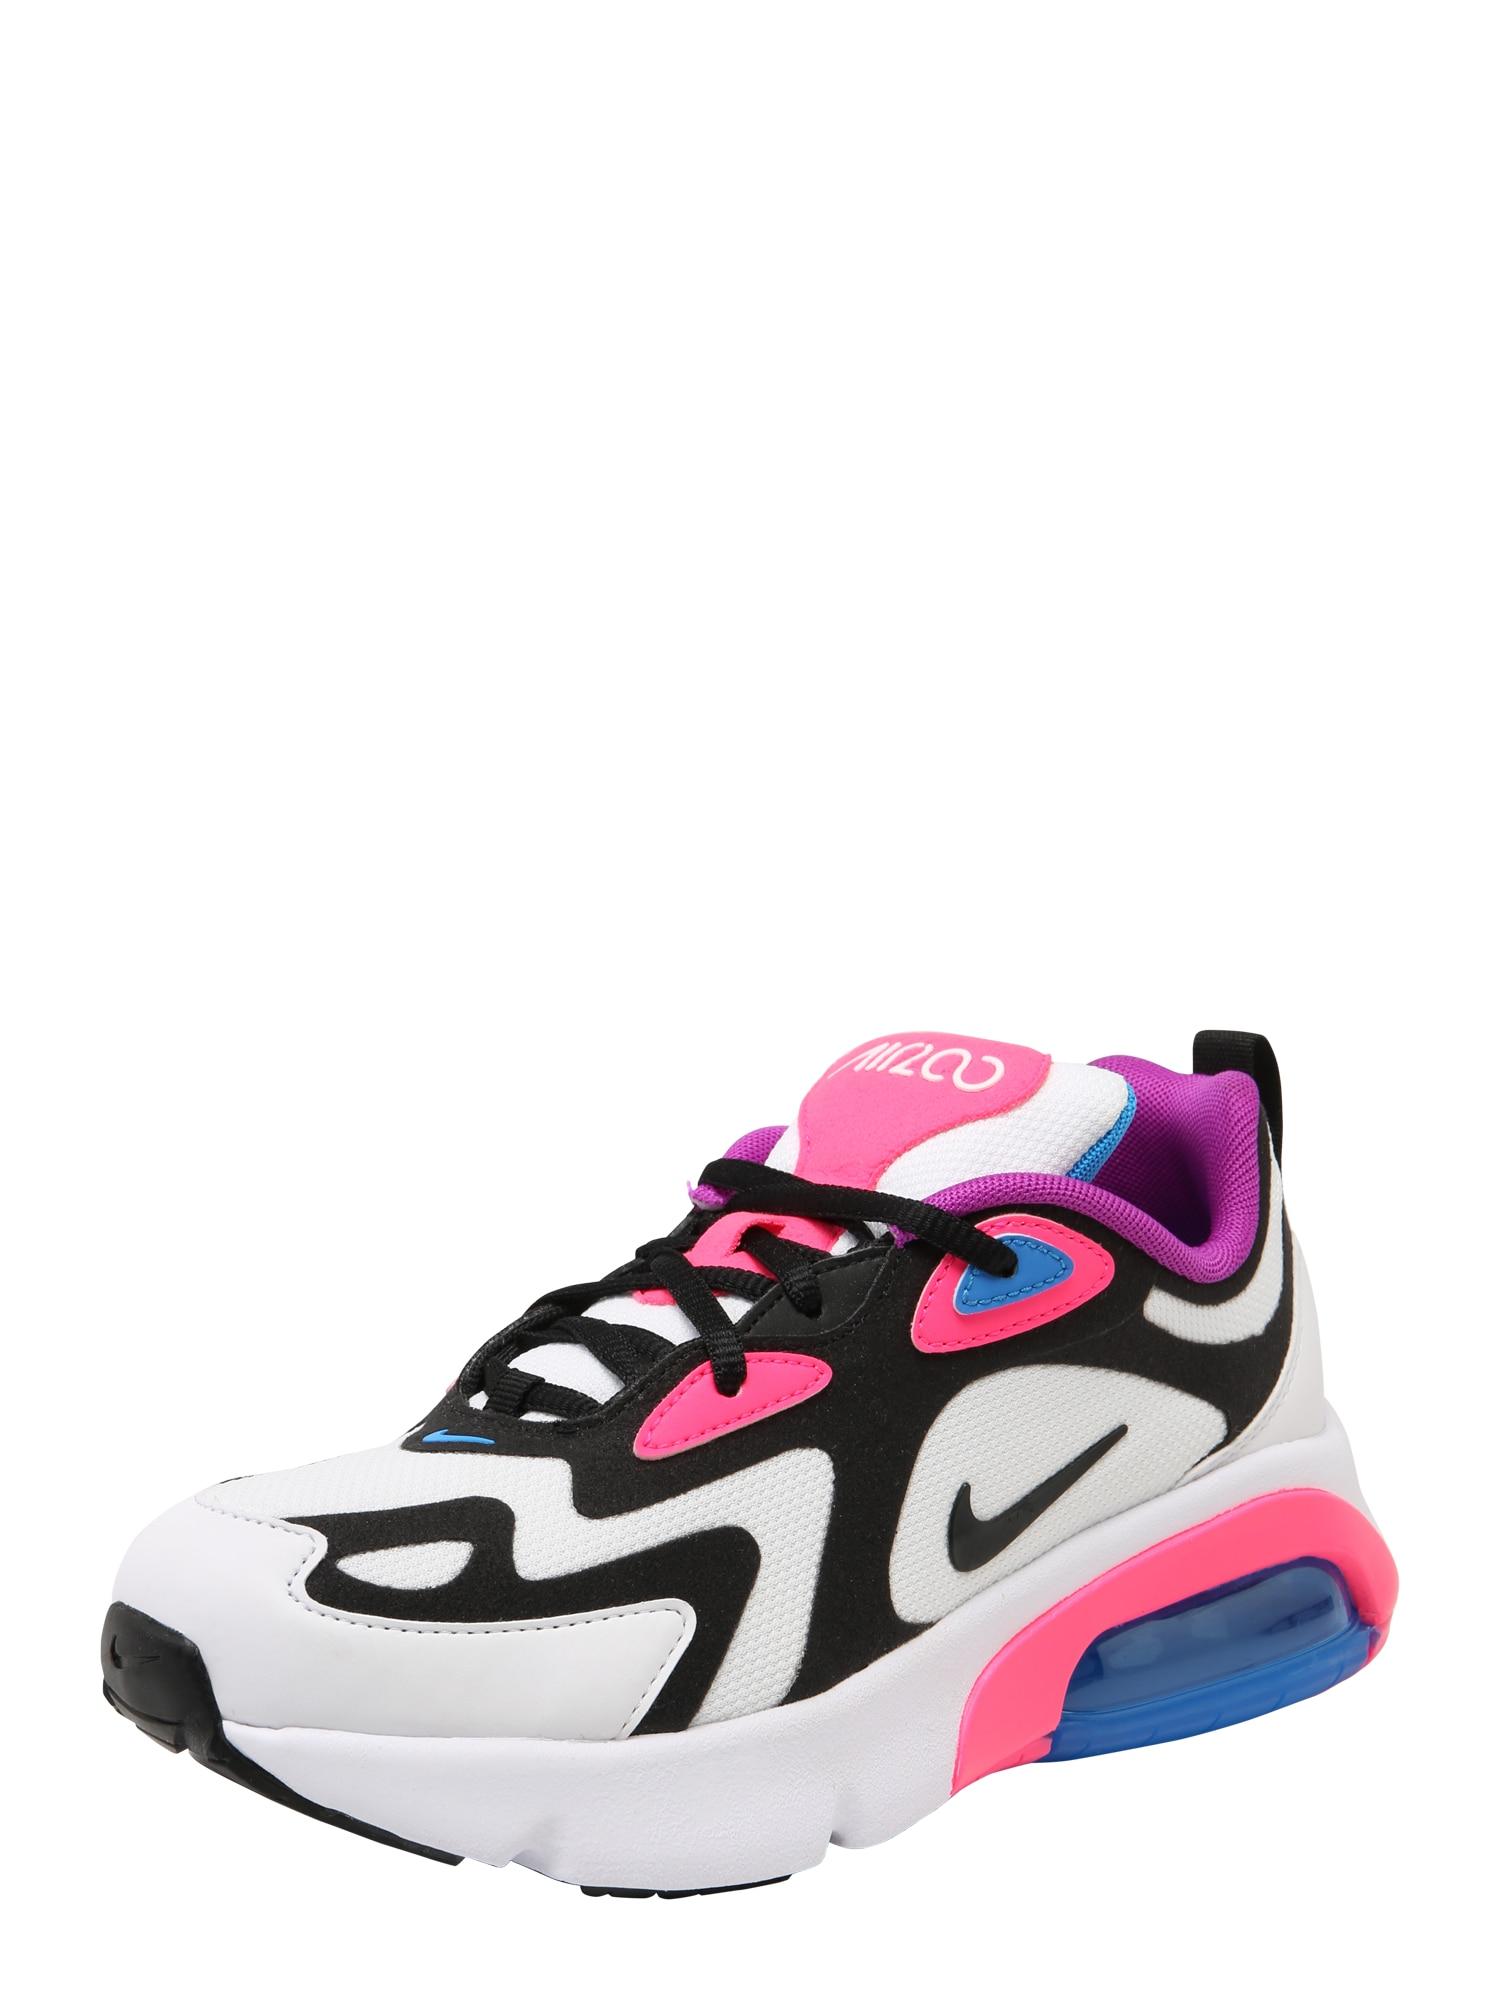 Tenisky AIR MAX 200 mix barev bílá Nike Sportswear